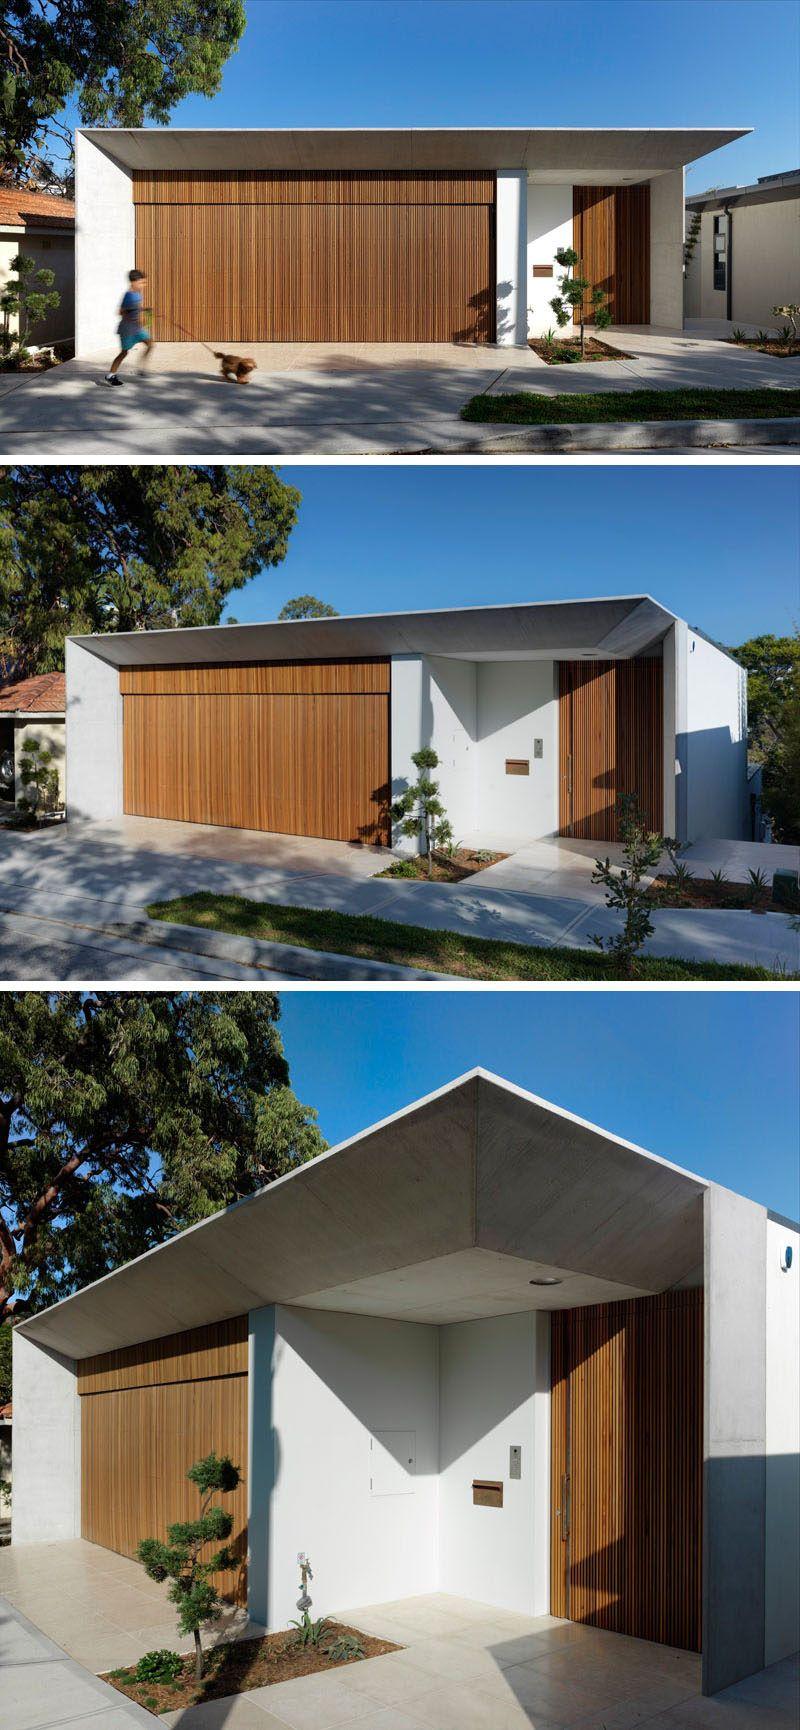 Modern Carport Garage: This House Hides Multiple Levels Behind Its Minimal Street